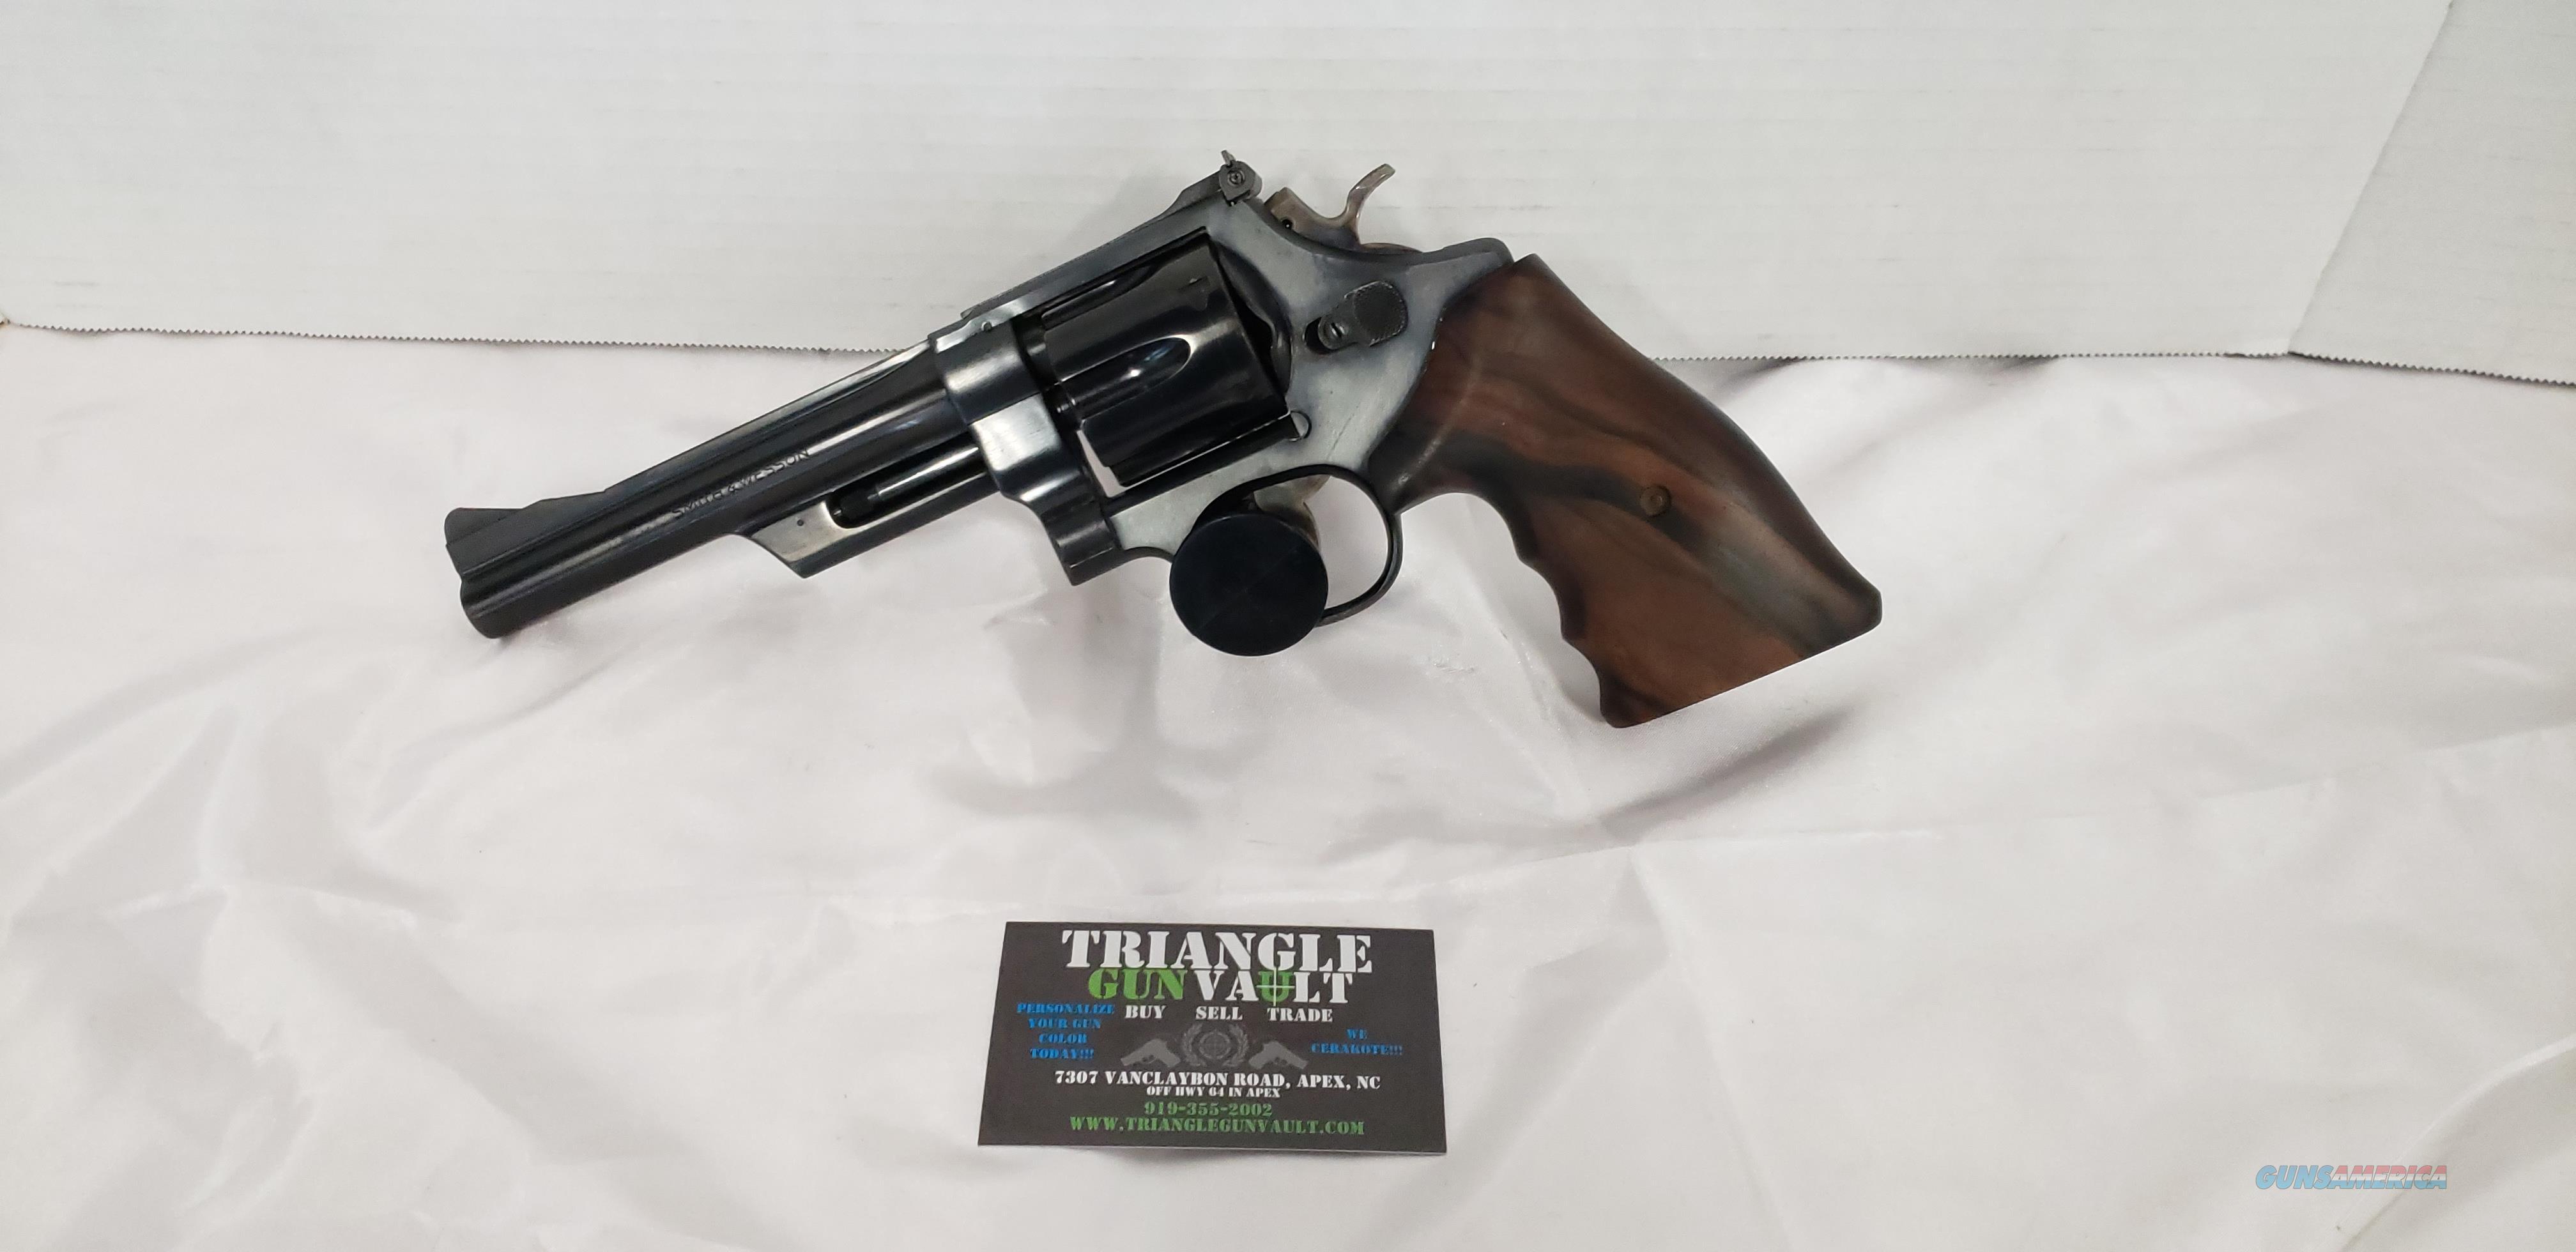 1962 Smith & Wesson 28-2  Guns > Pistols > Smith & Wesson Revolvers > Full Frame Revolver